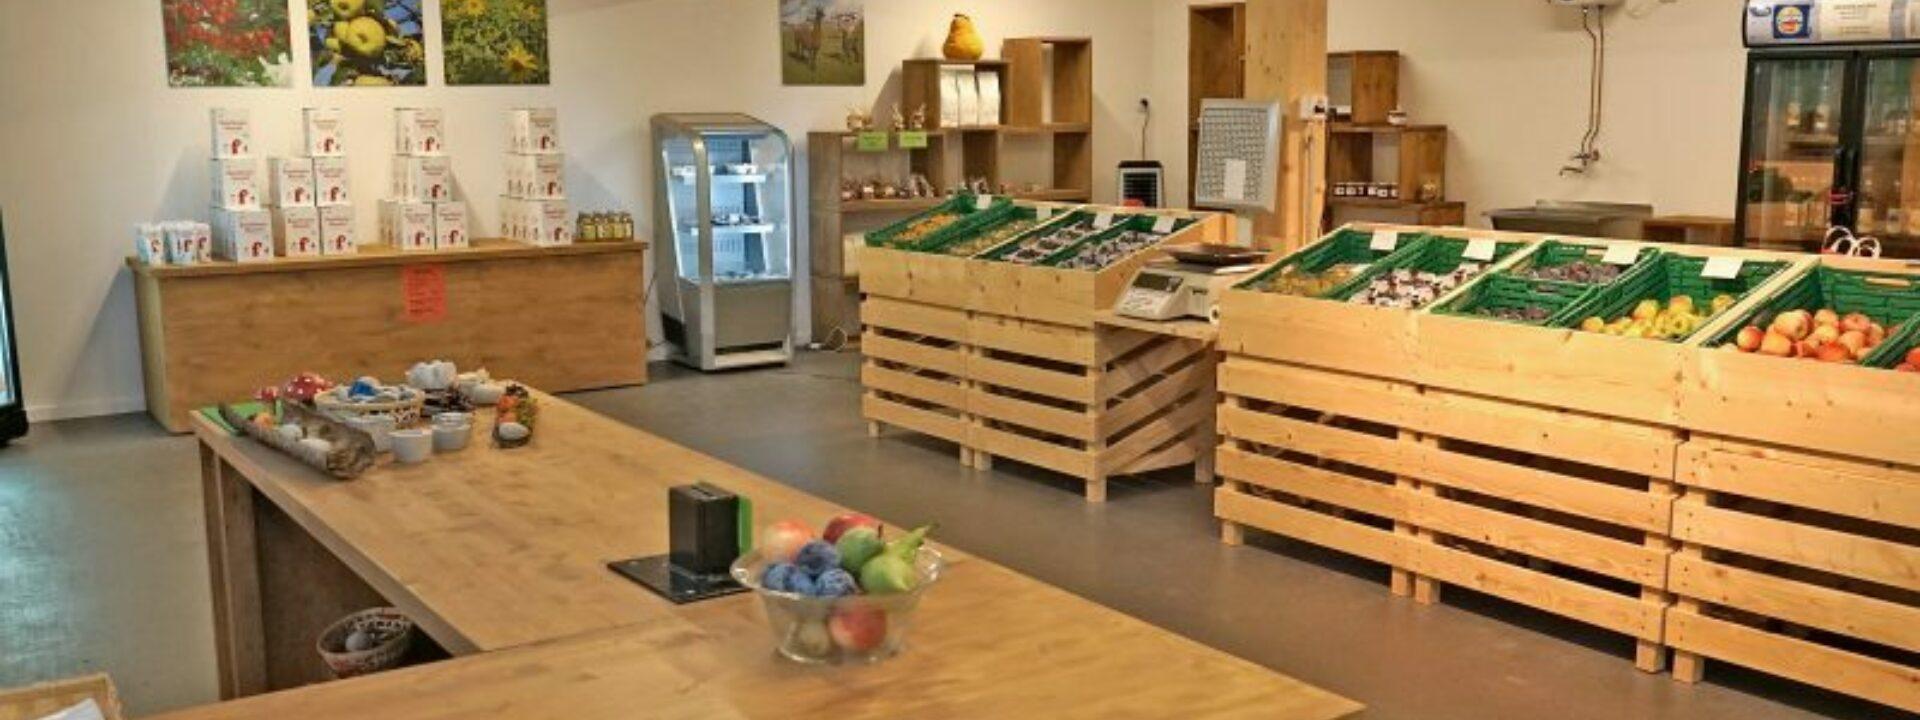 Lüthi Obstbau - Öpfelhüsli